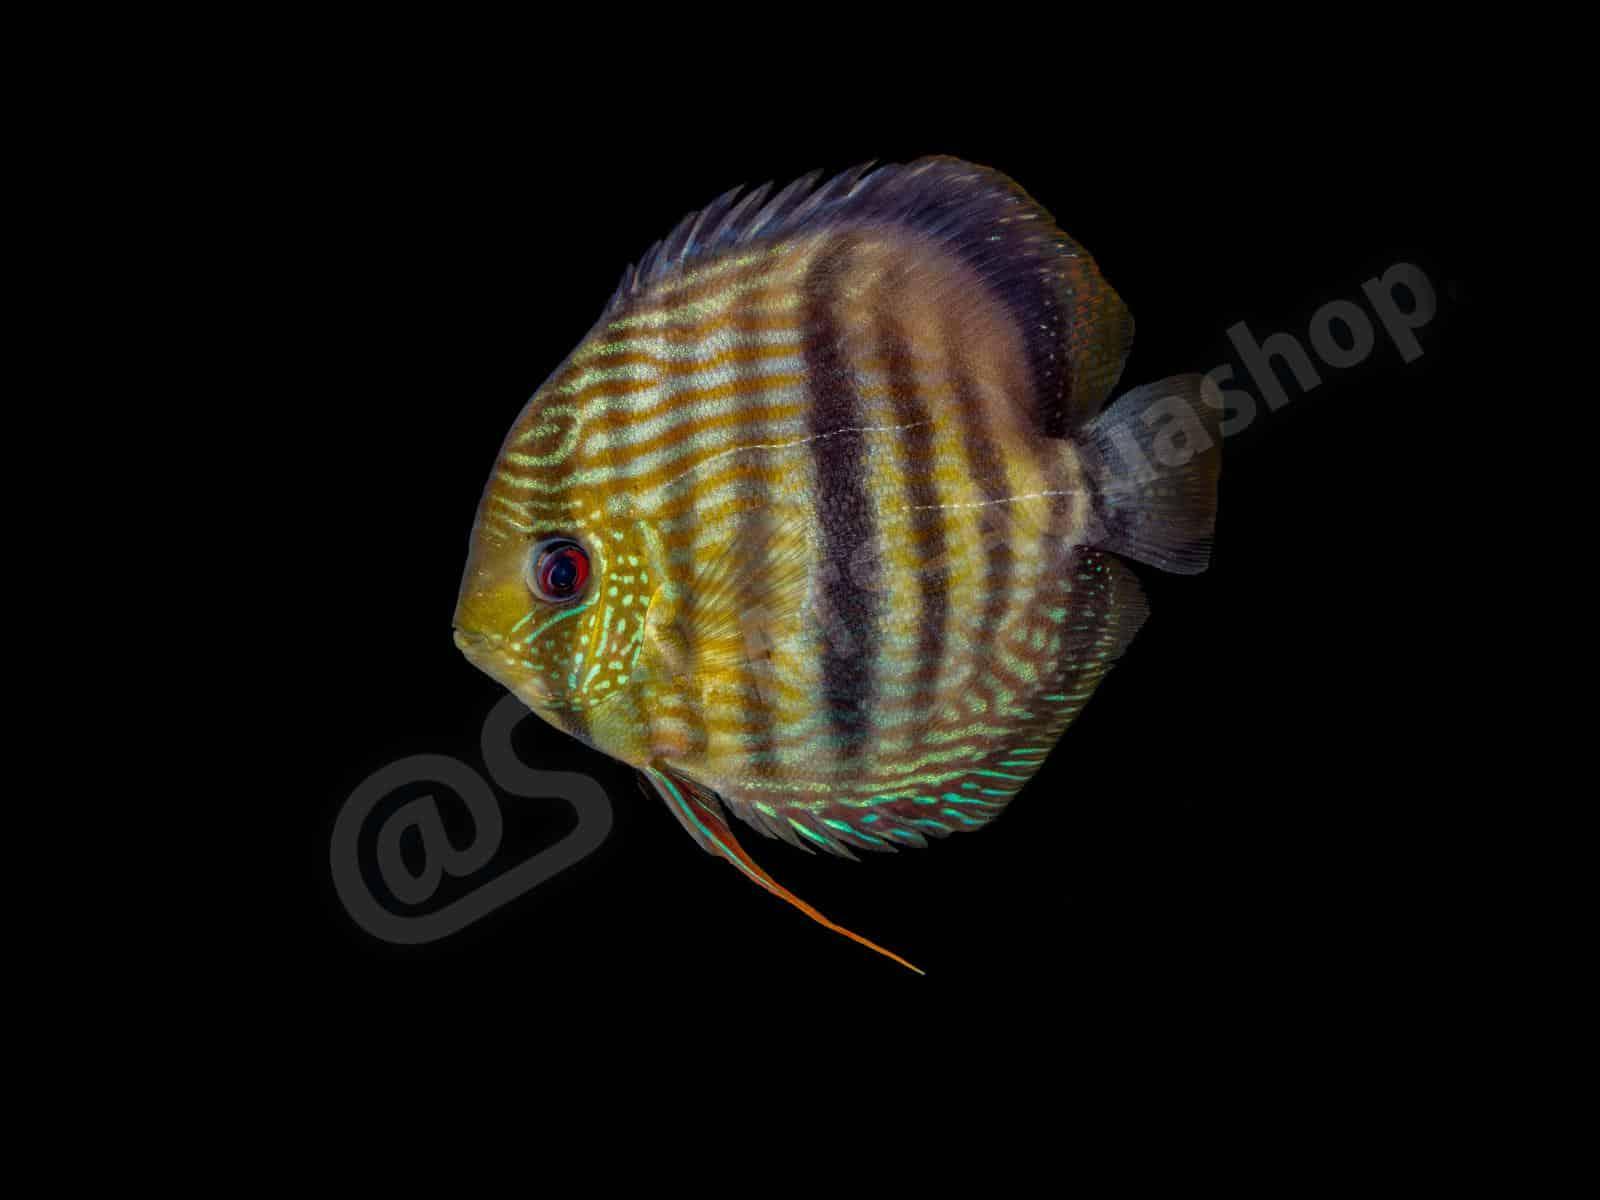 symphysodon diskus nhamunda andreas tanke 0095 7